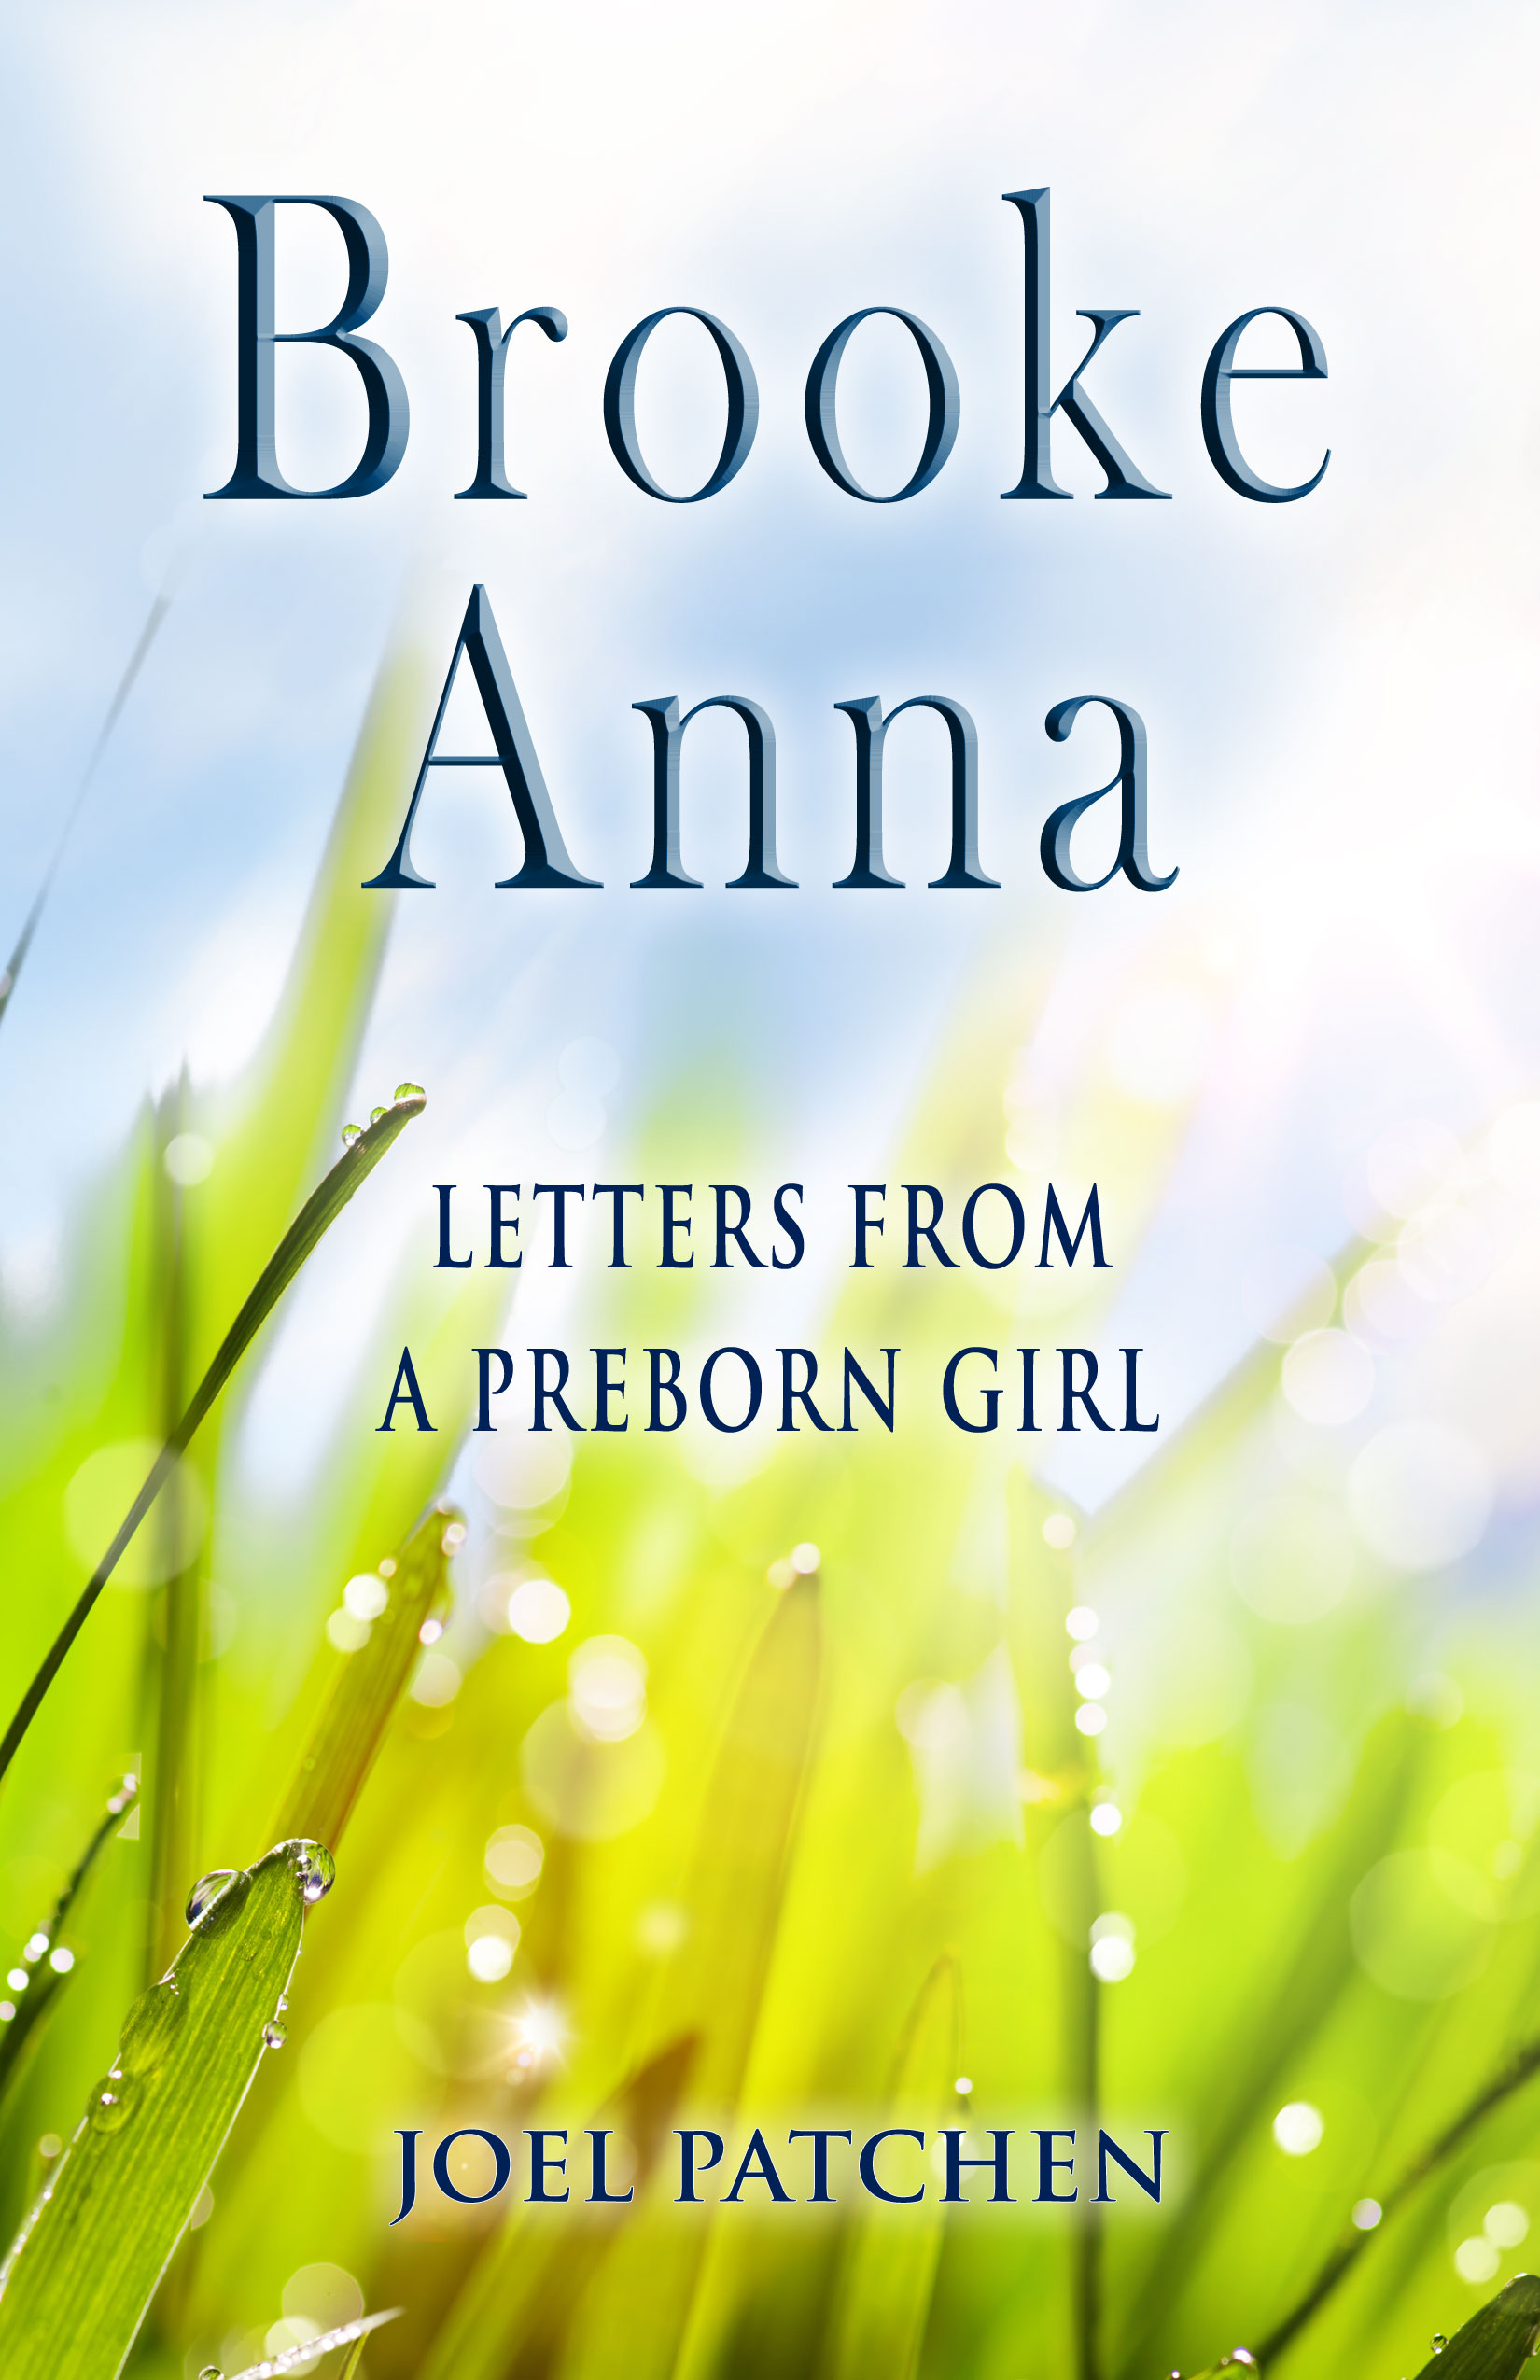 Brooke Anna by Joel Patchen